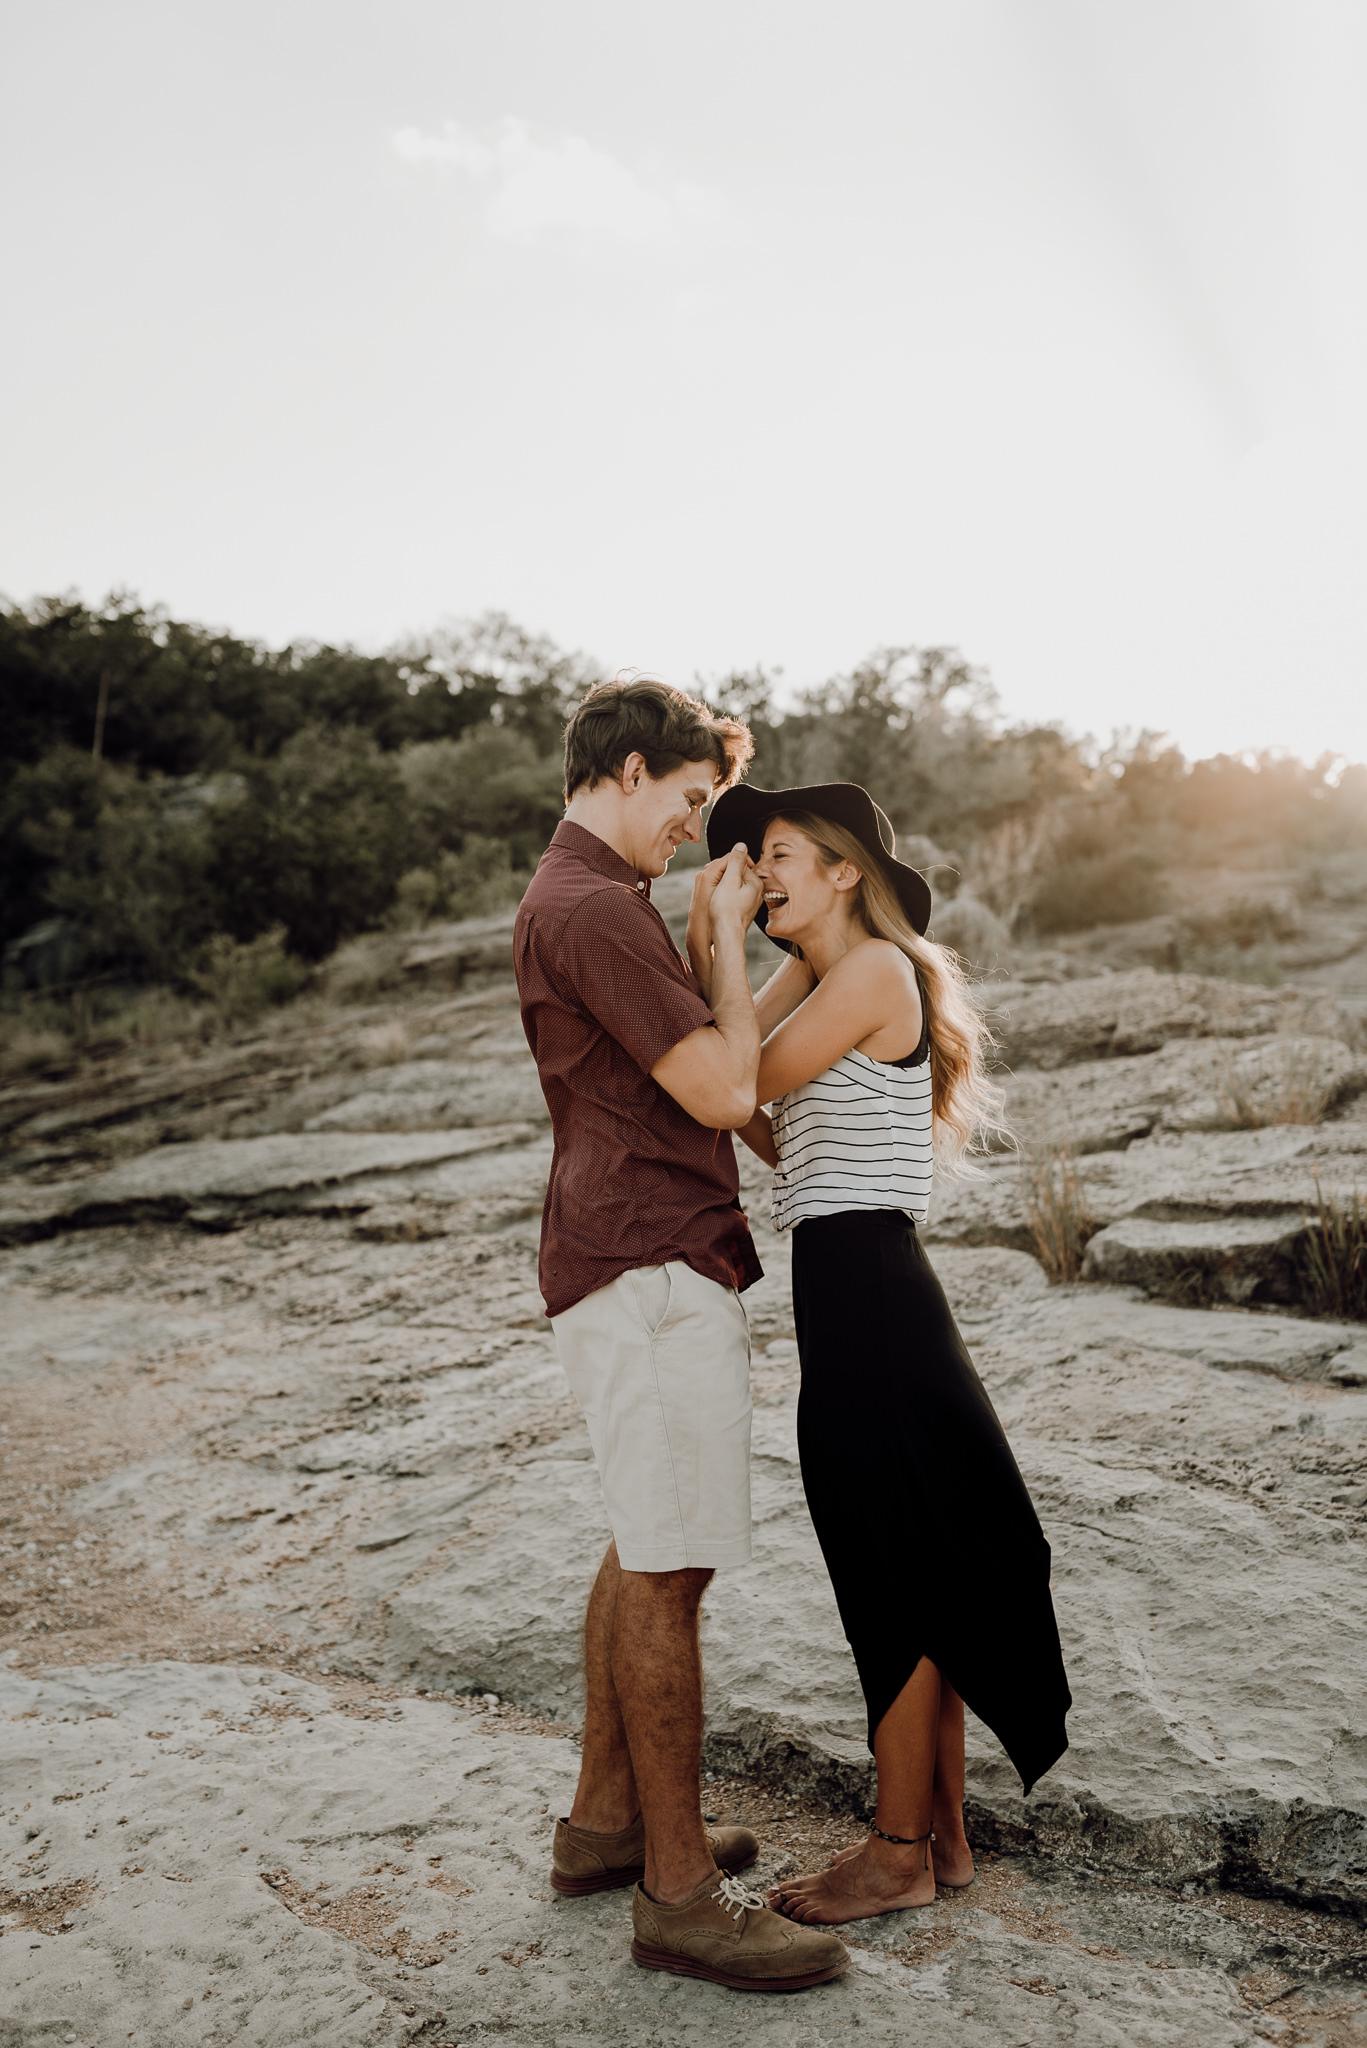 Michelle + Aron | Pederbales Falls Texas Engagement| Kristen Giles Photography - 028.jpg